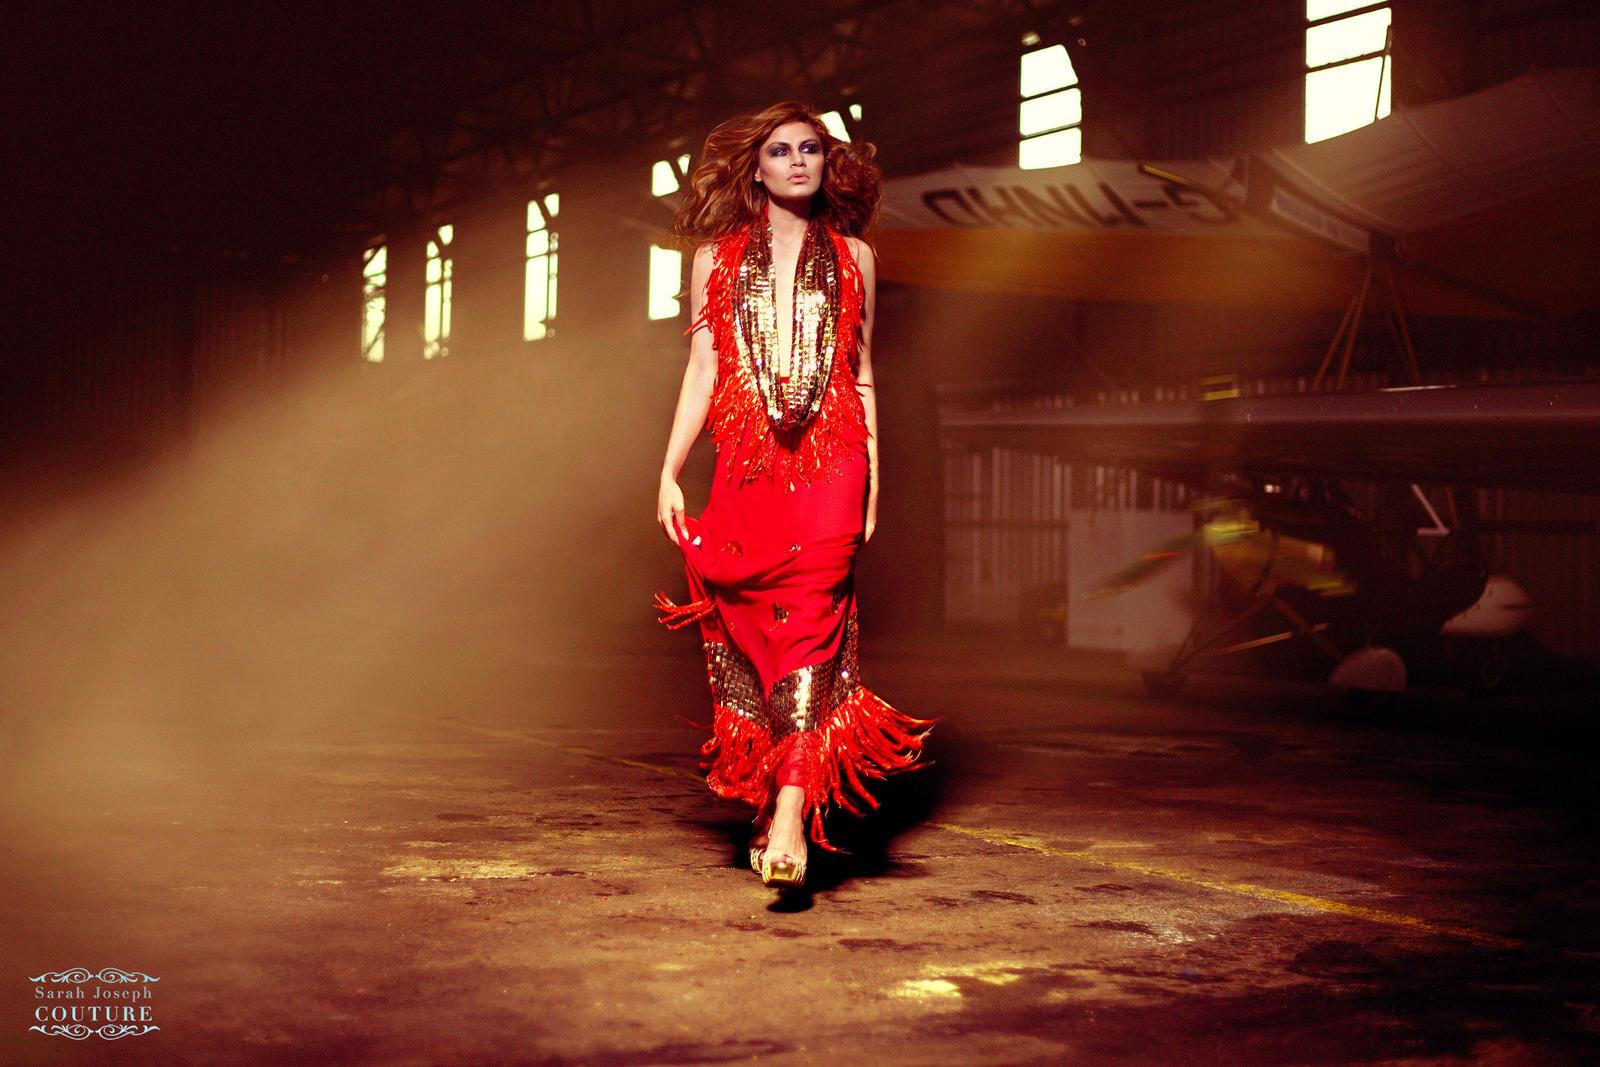 Sarah Joseph | Couture by Ryan-Bater